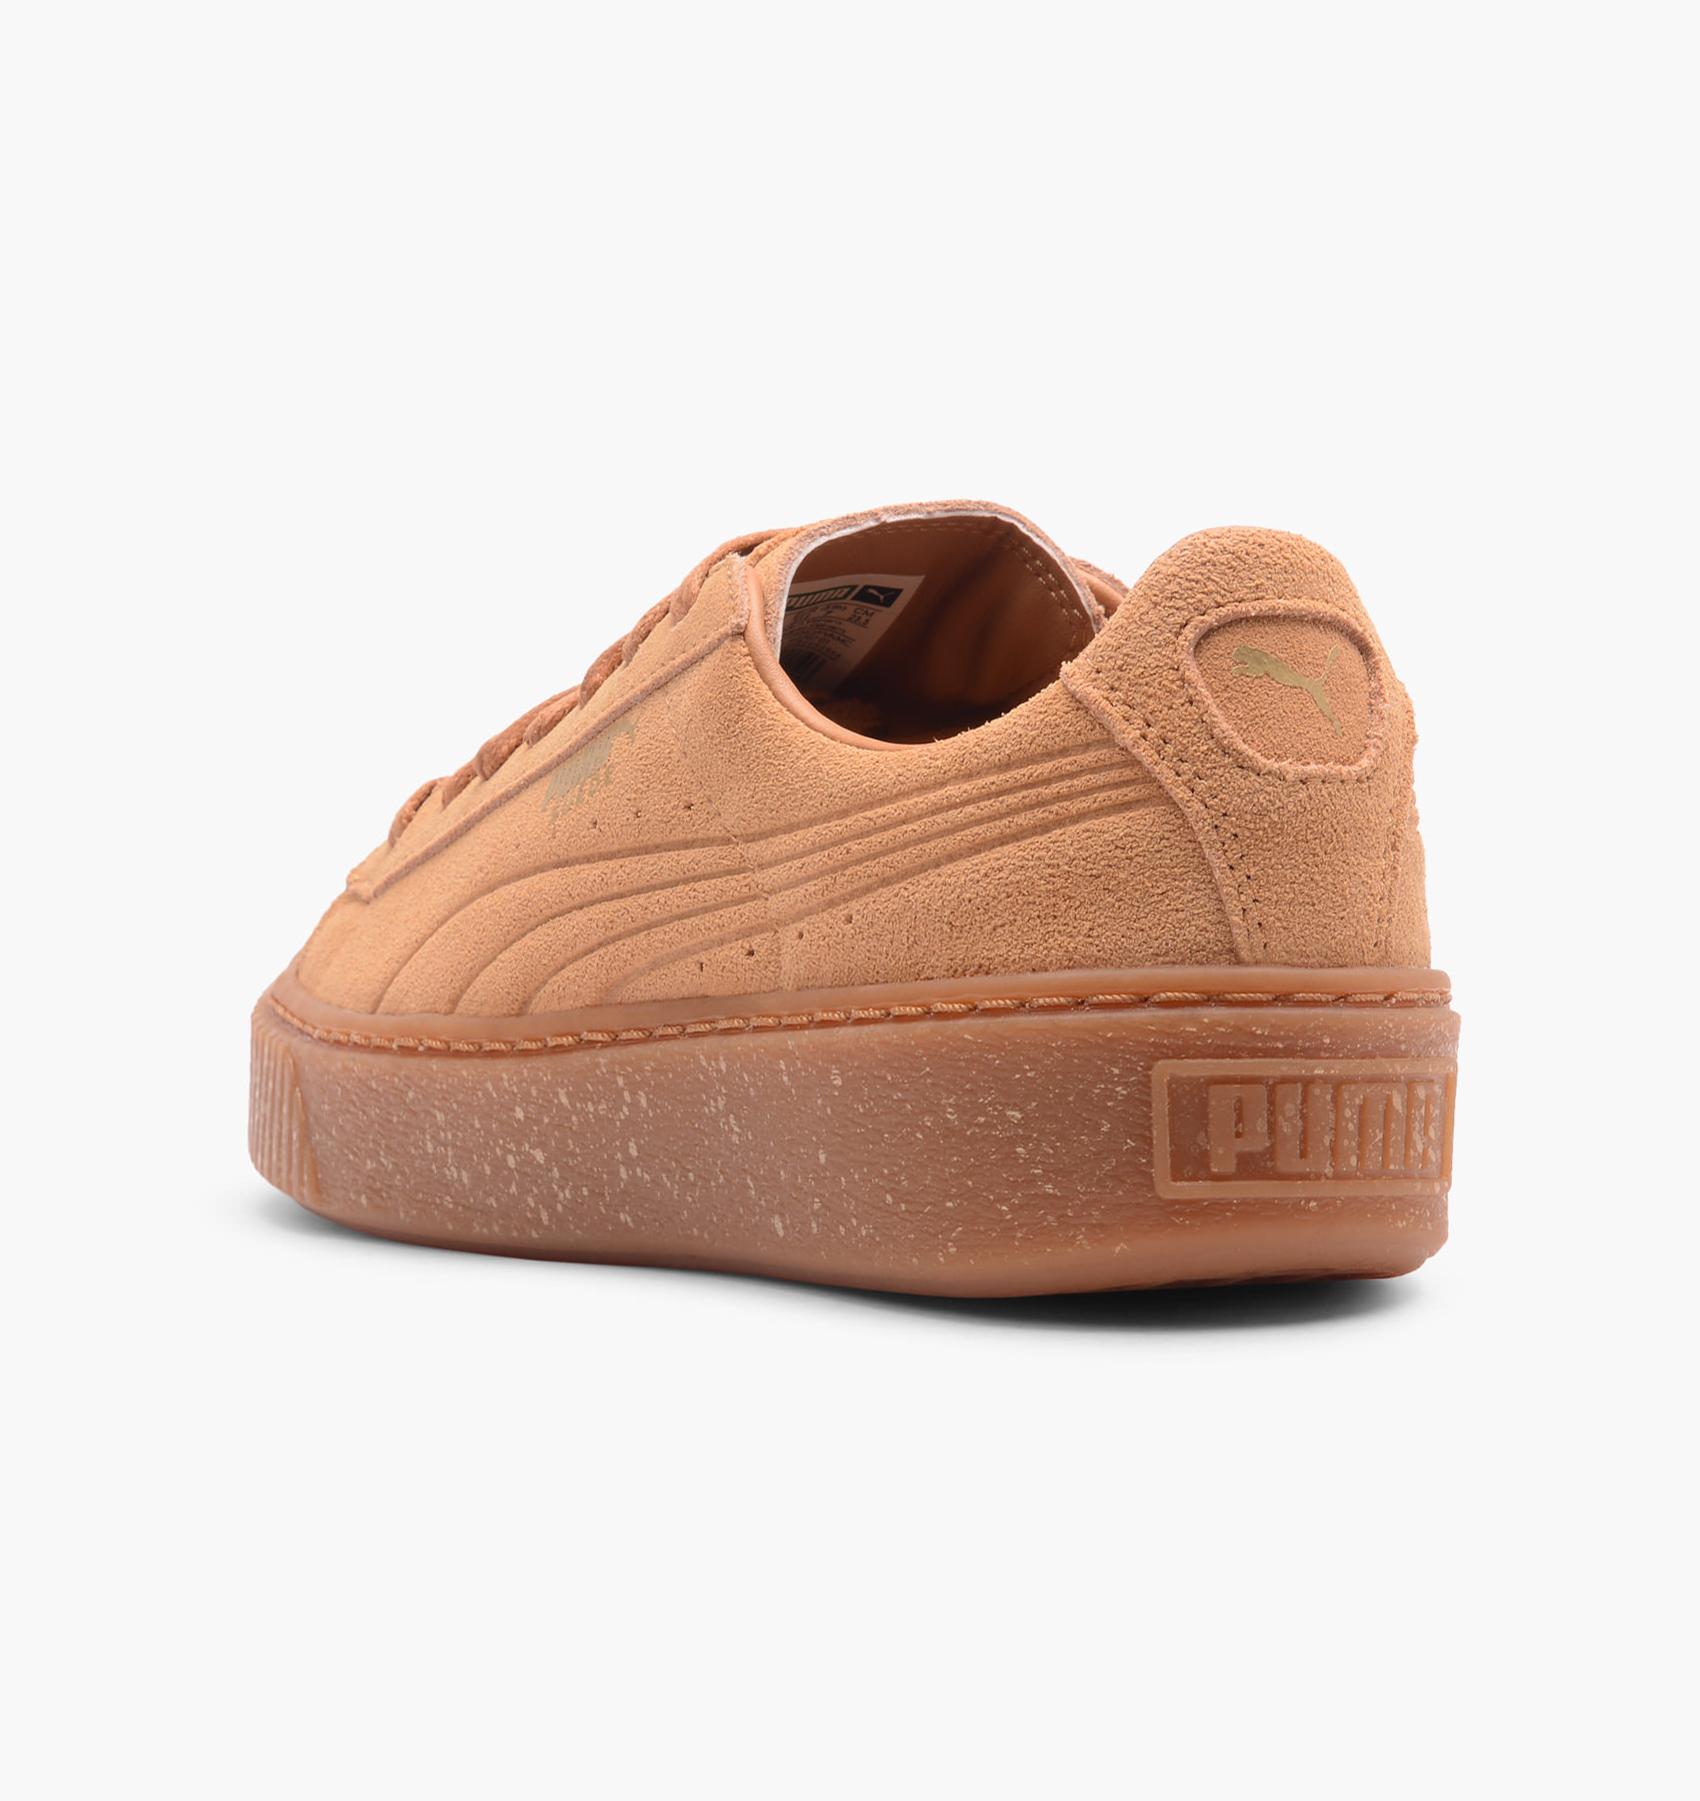 Puma Suede Platform Speckled Biscuit Cool Sneakers